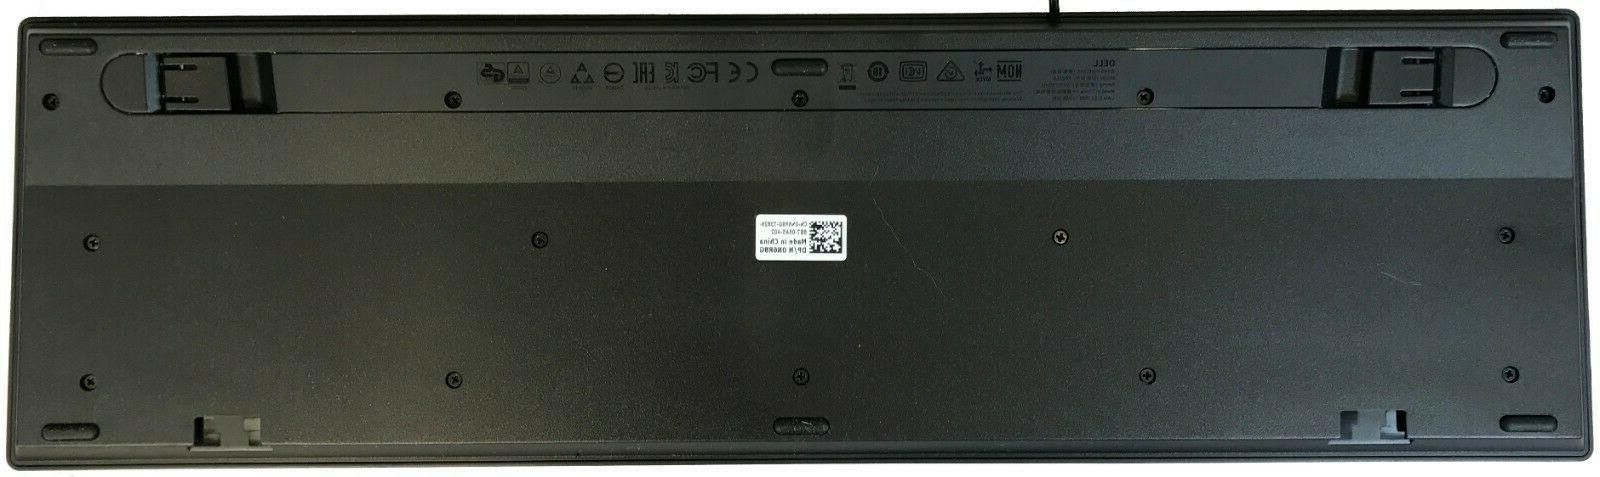 New Genuine KB216-BK-US Multimedia Wired Keyboard Black 644G3